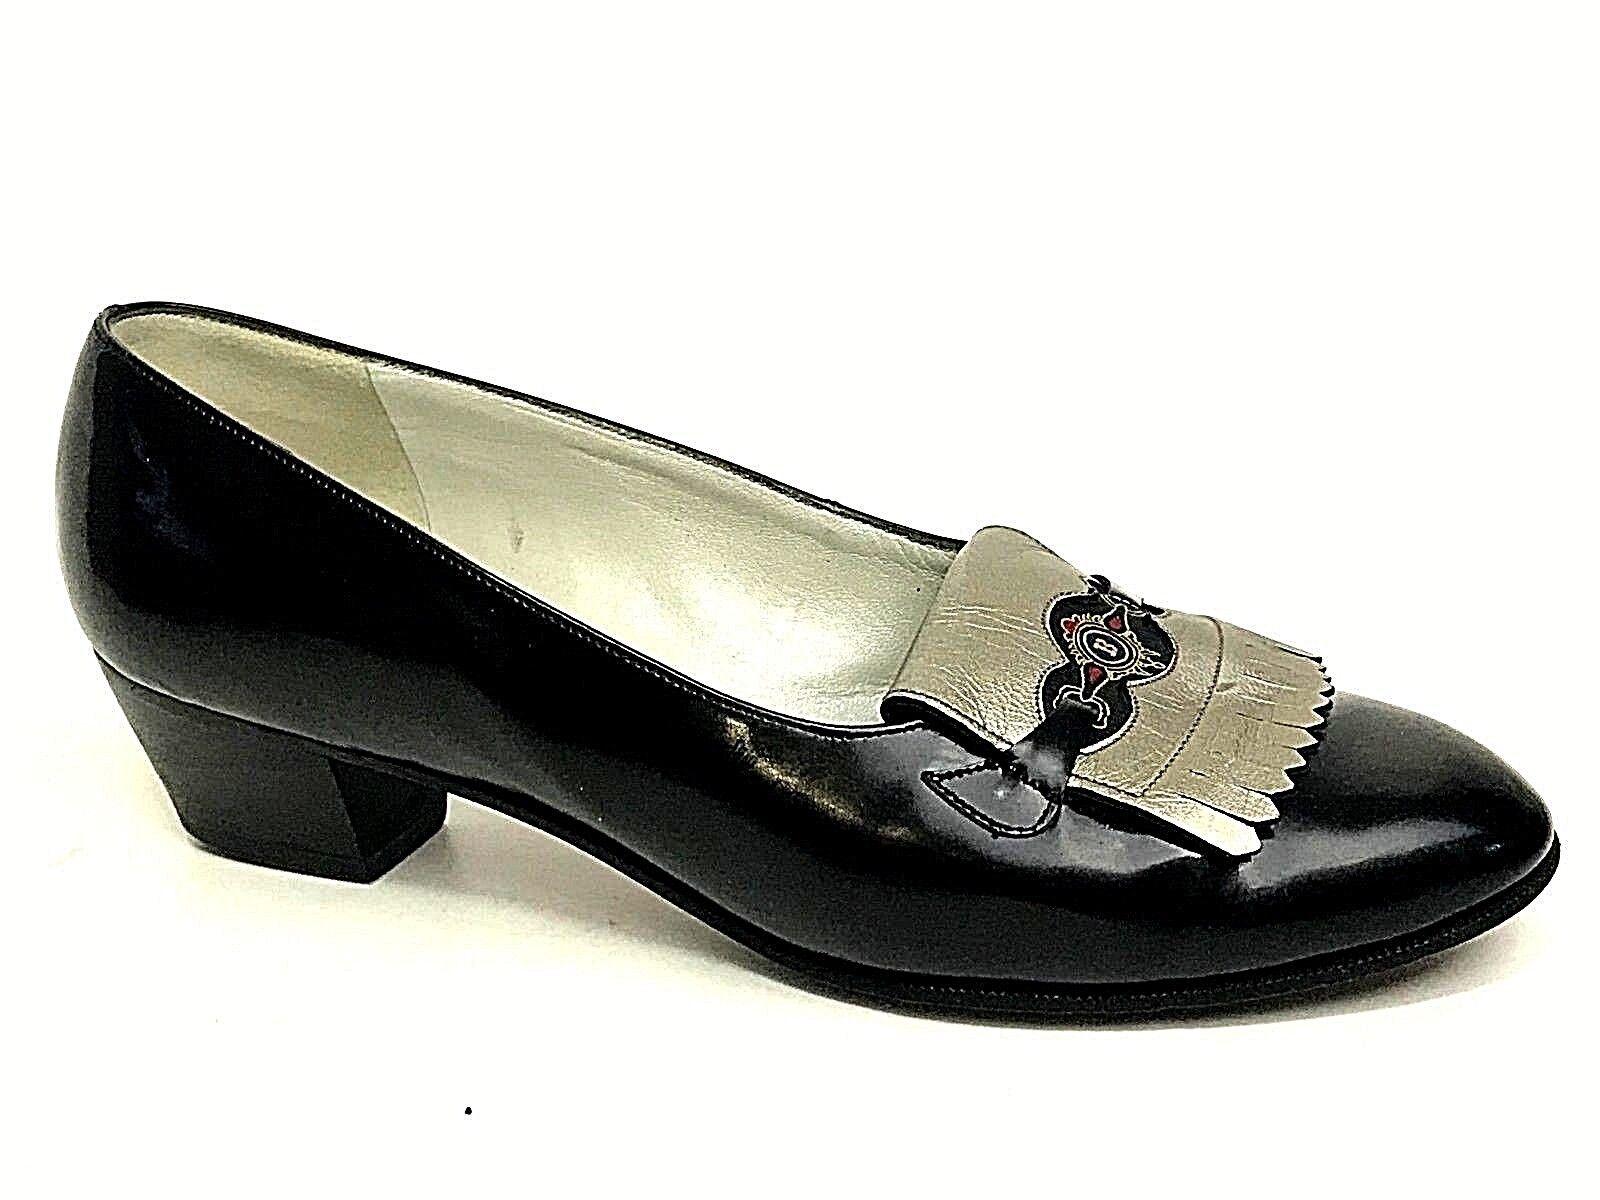 Bally Suisse  Bellezza Rear Women's Black Loafer shoes US.5.5E EU.36 UK.3.5